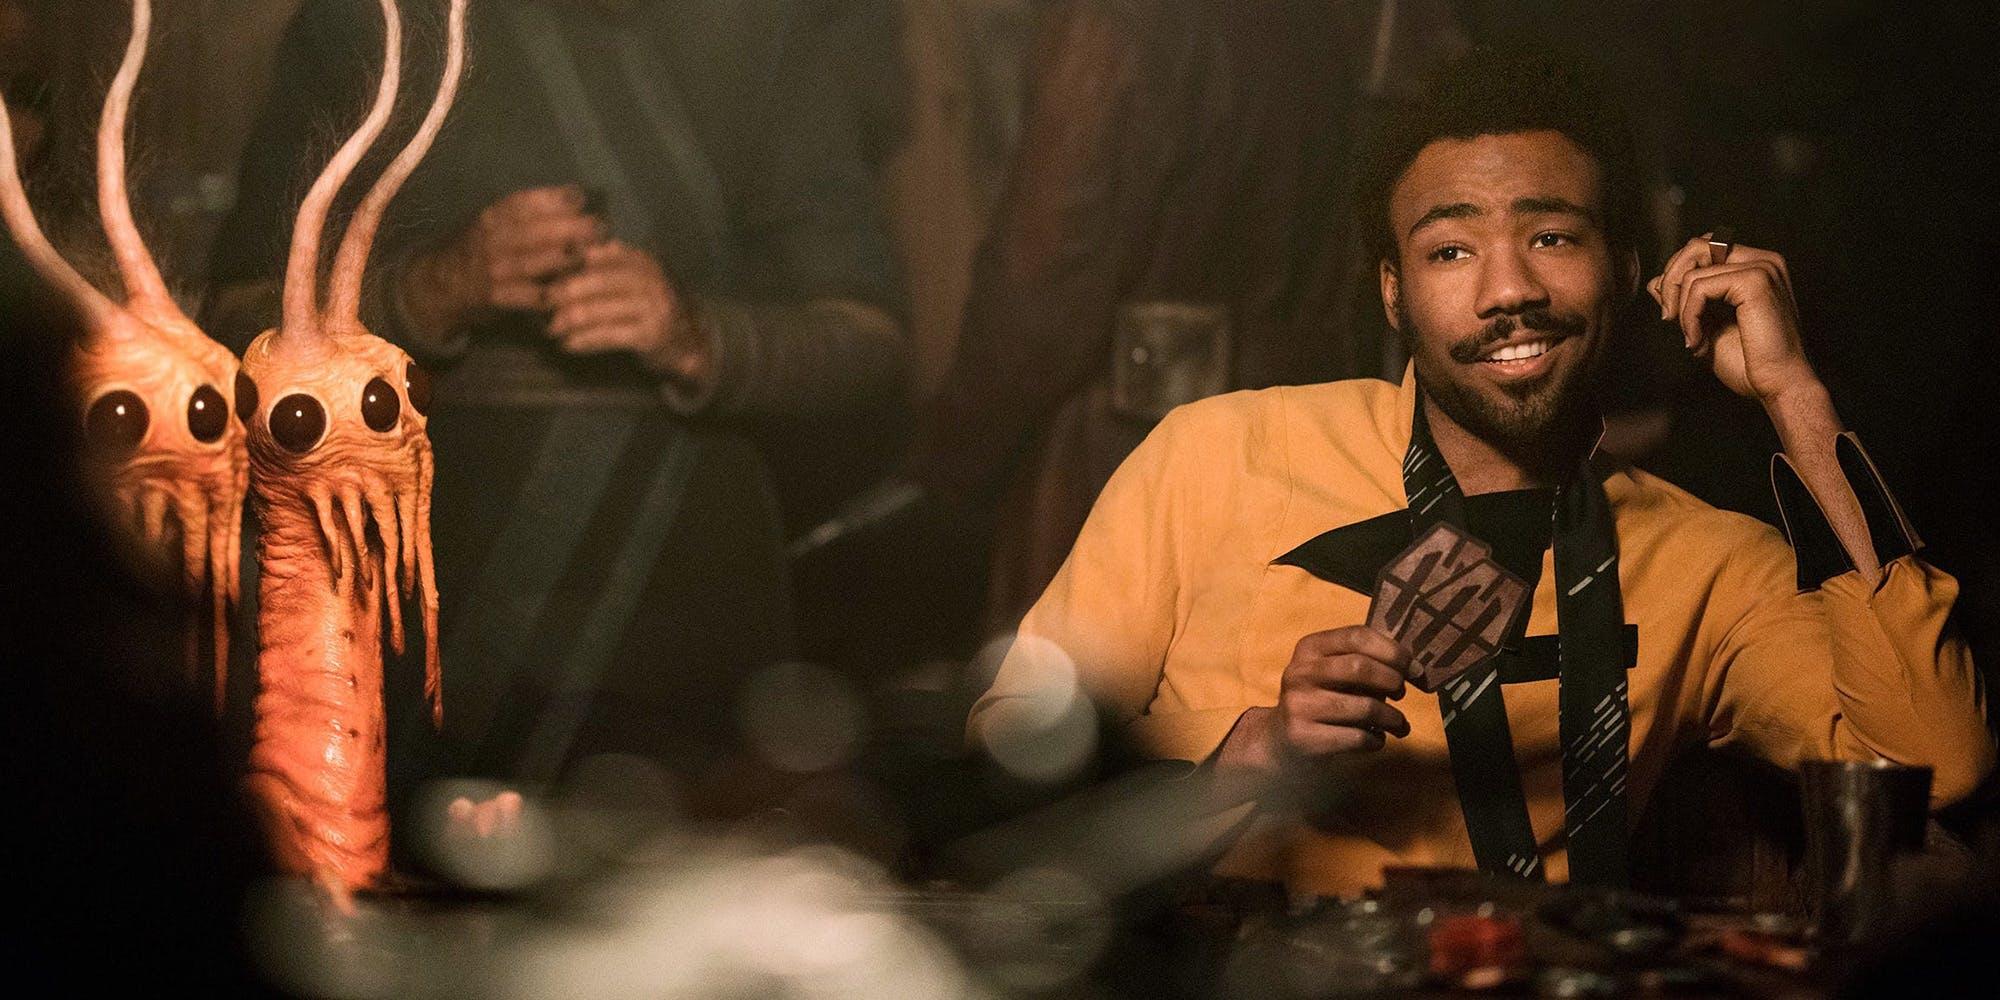 Donald-Glover-as-Lando-Calrissian-in-Han-Solo-movie.jpg